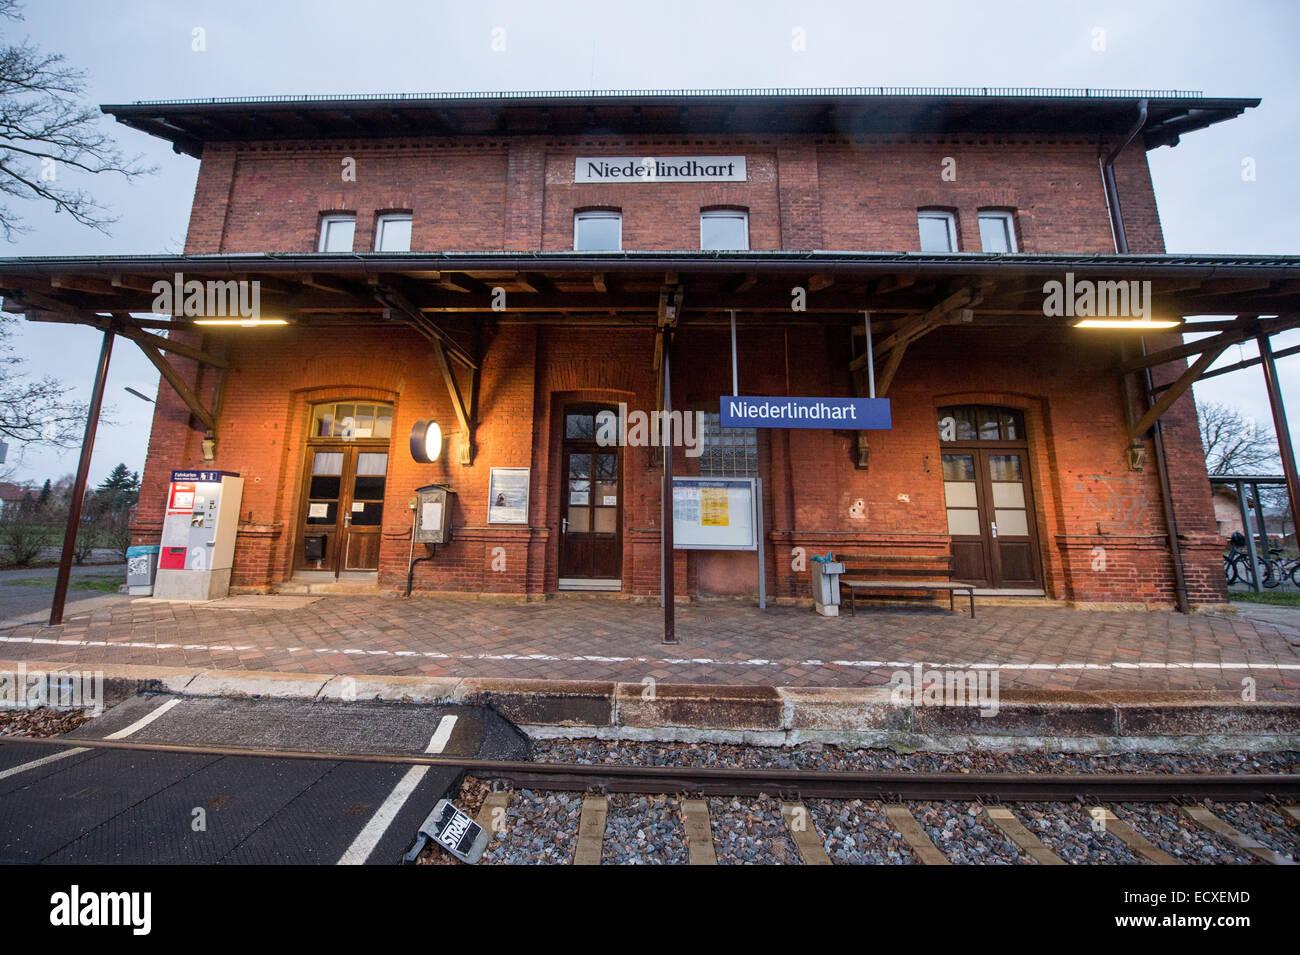 Niederlindhart, Germany. 21st Dec, 2014. An African asylum seeker was beaten up by three uidentified men in a regional - Stock Image